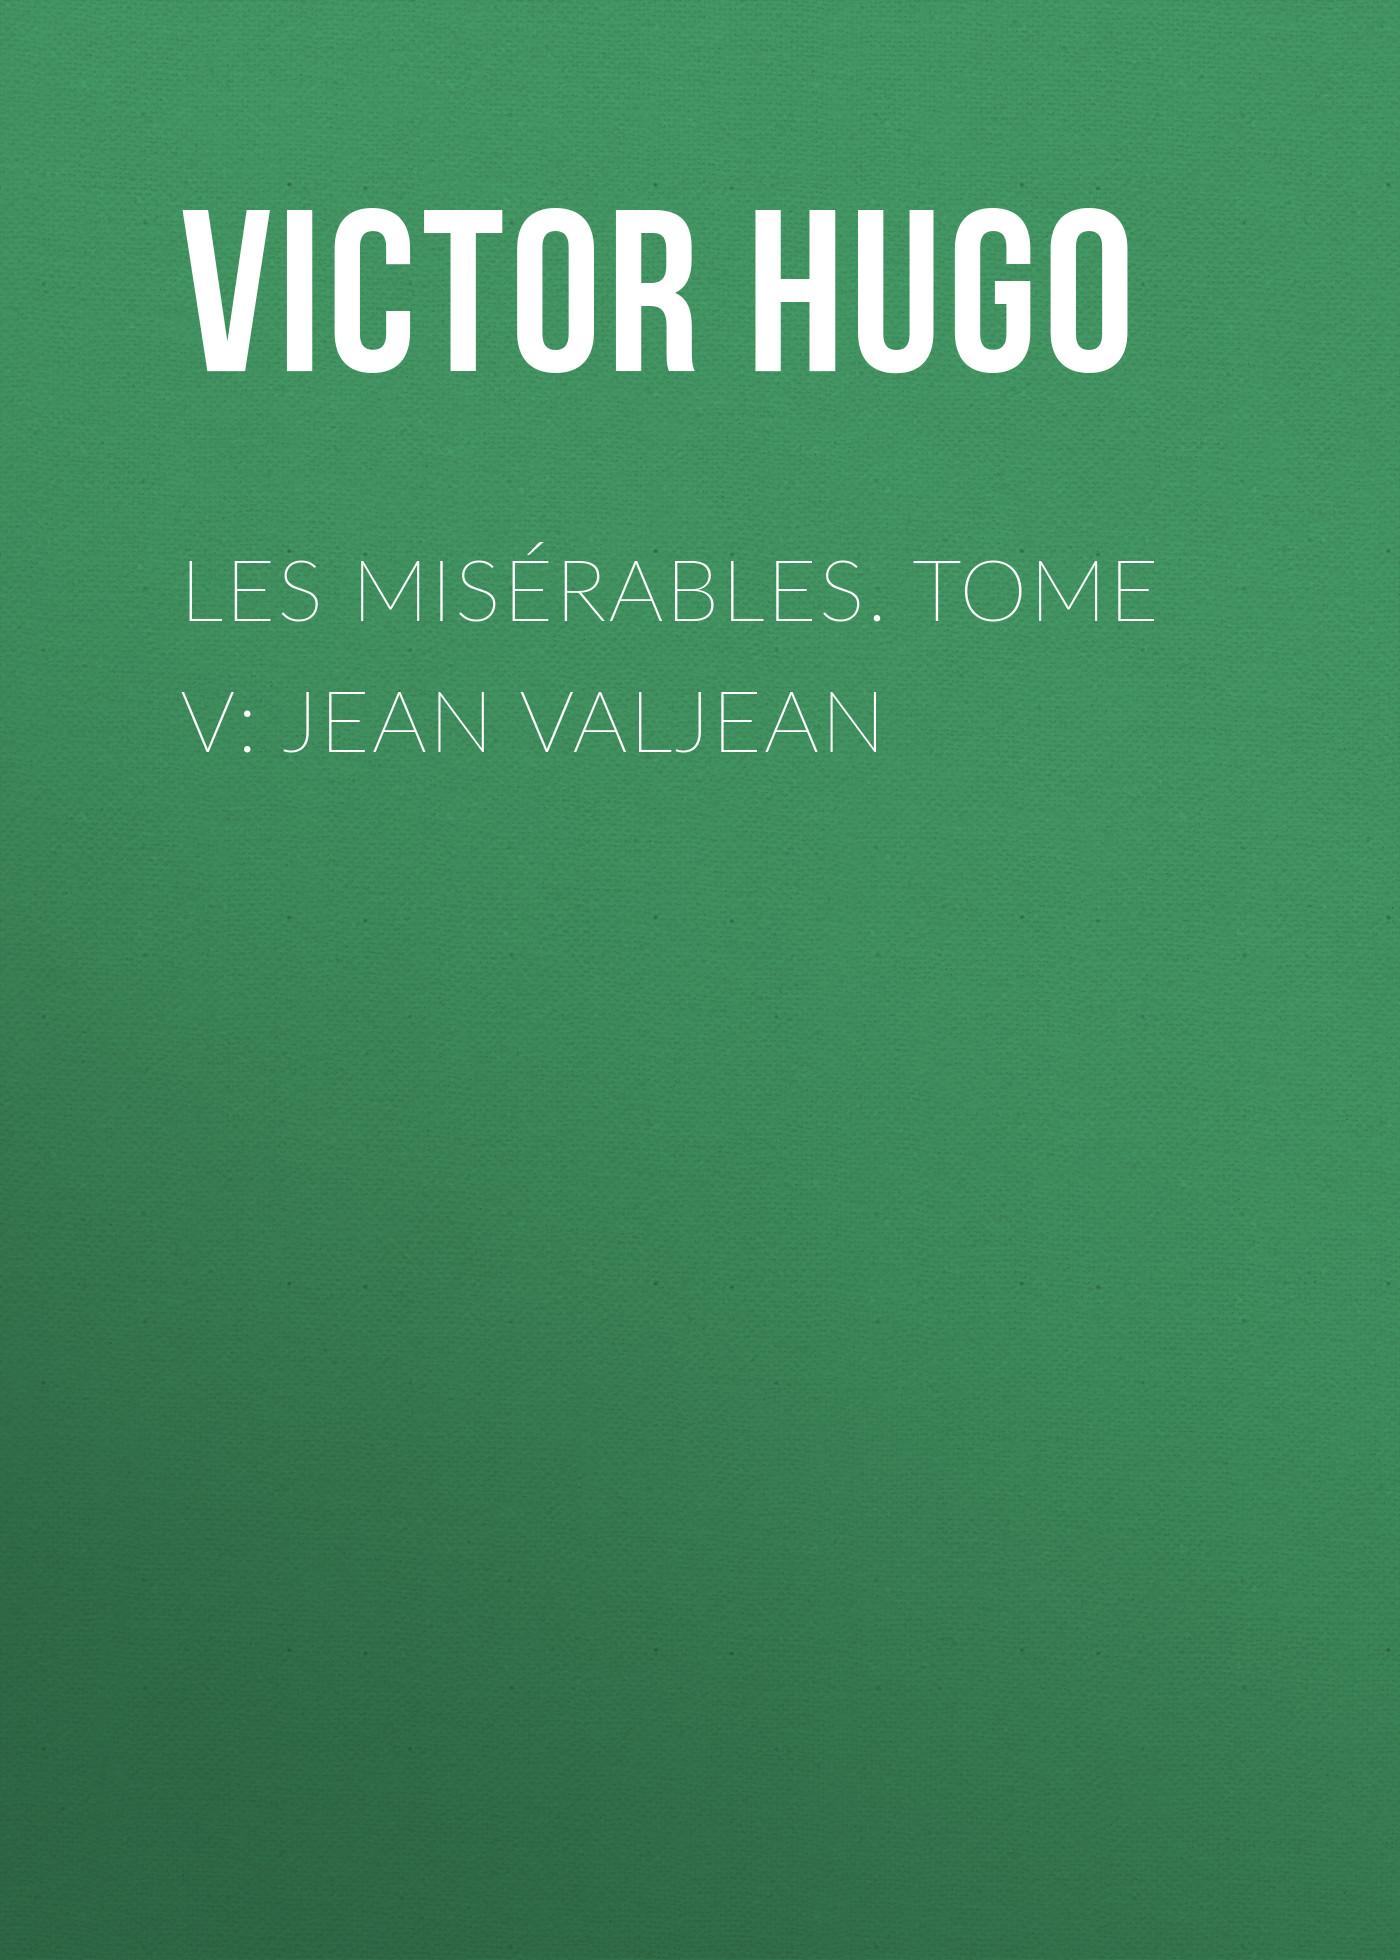 Виктор Мари Гюго Les misérables. Tome V: Jean Valjean цена